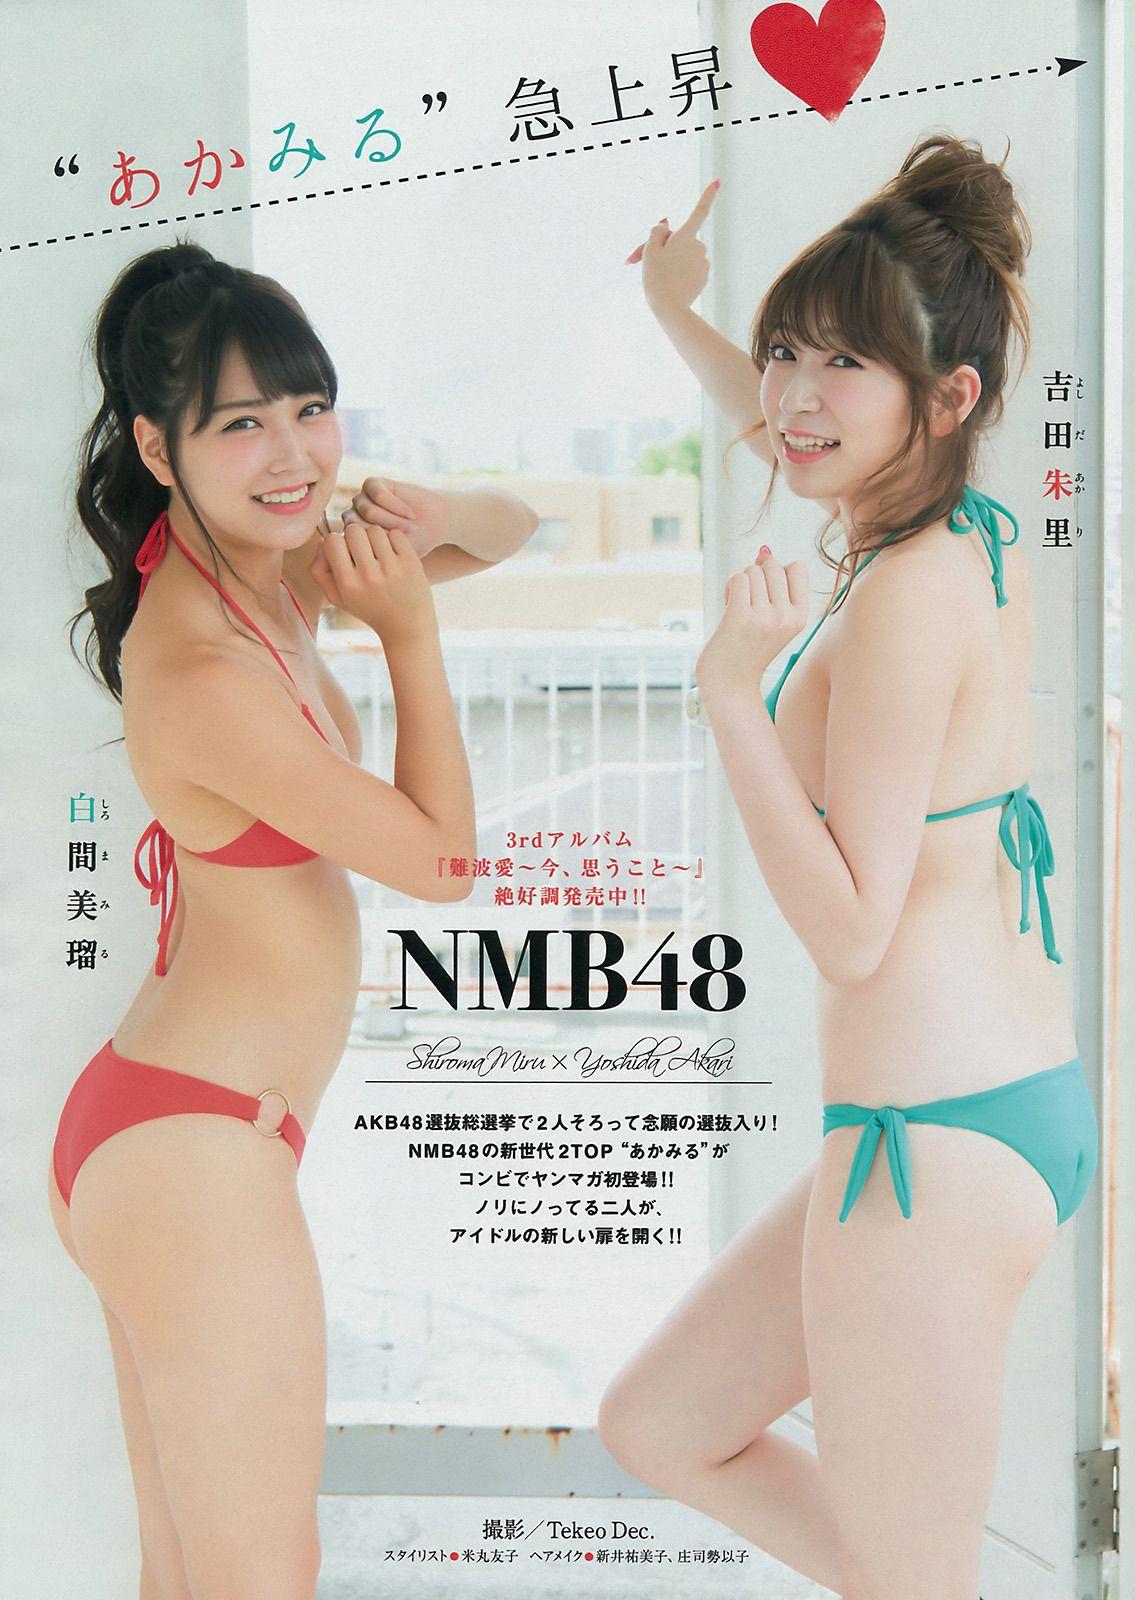 483ec656b25 白間美瑠!&吉田朱里! | NMB48! | 朱里、水着、アイドル